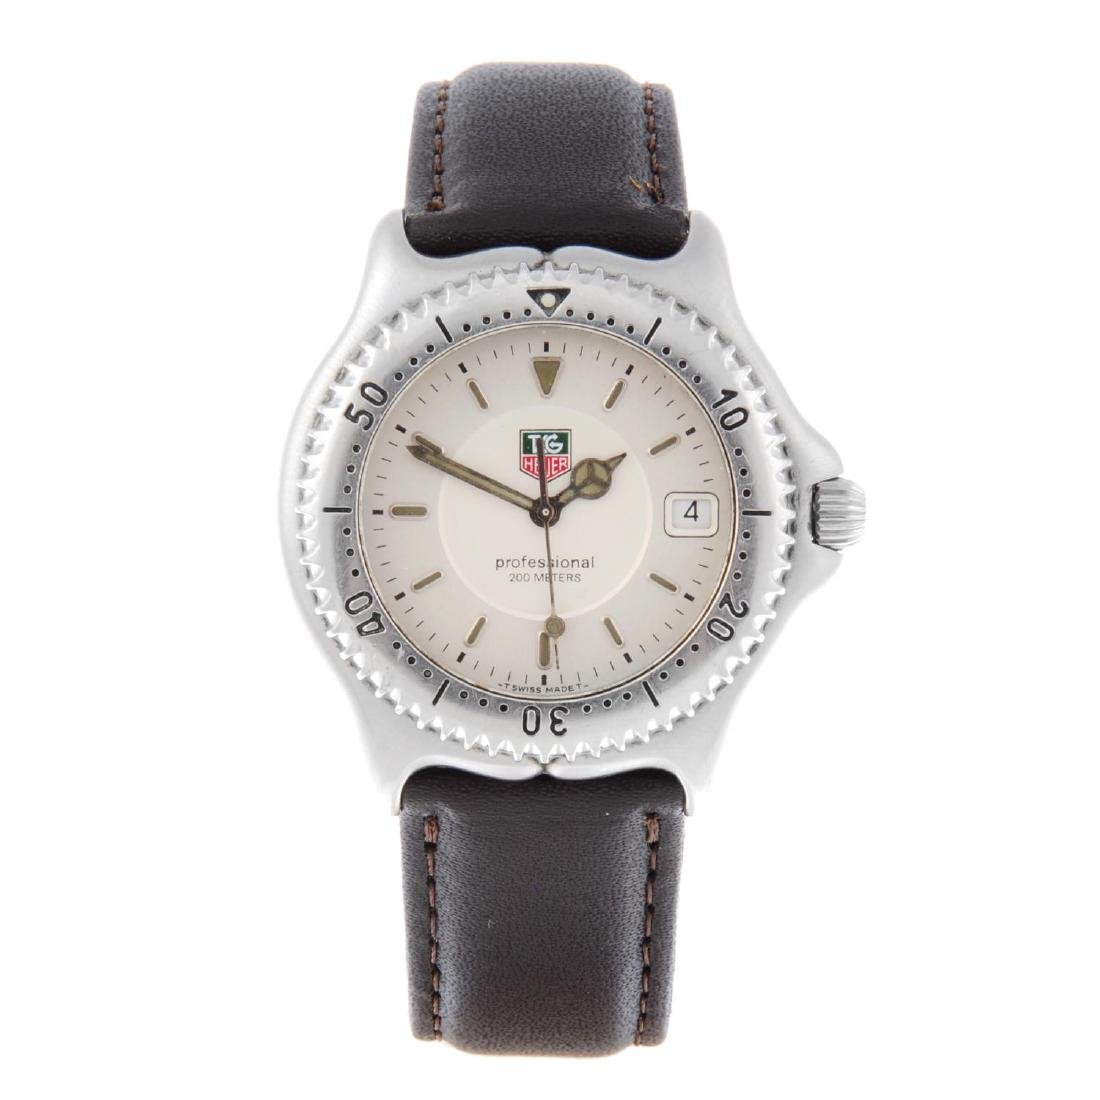 TAG HEUER - a gentleman's S/el Series wrist watch.